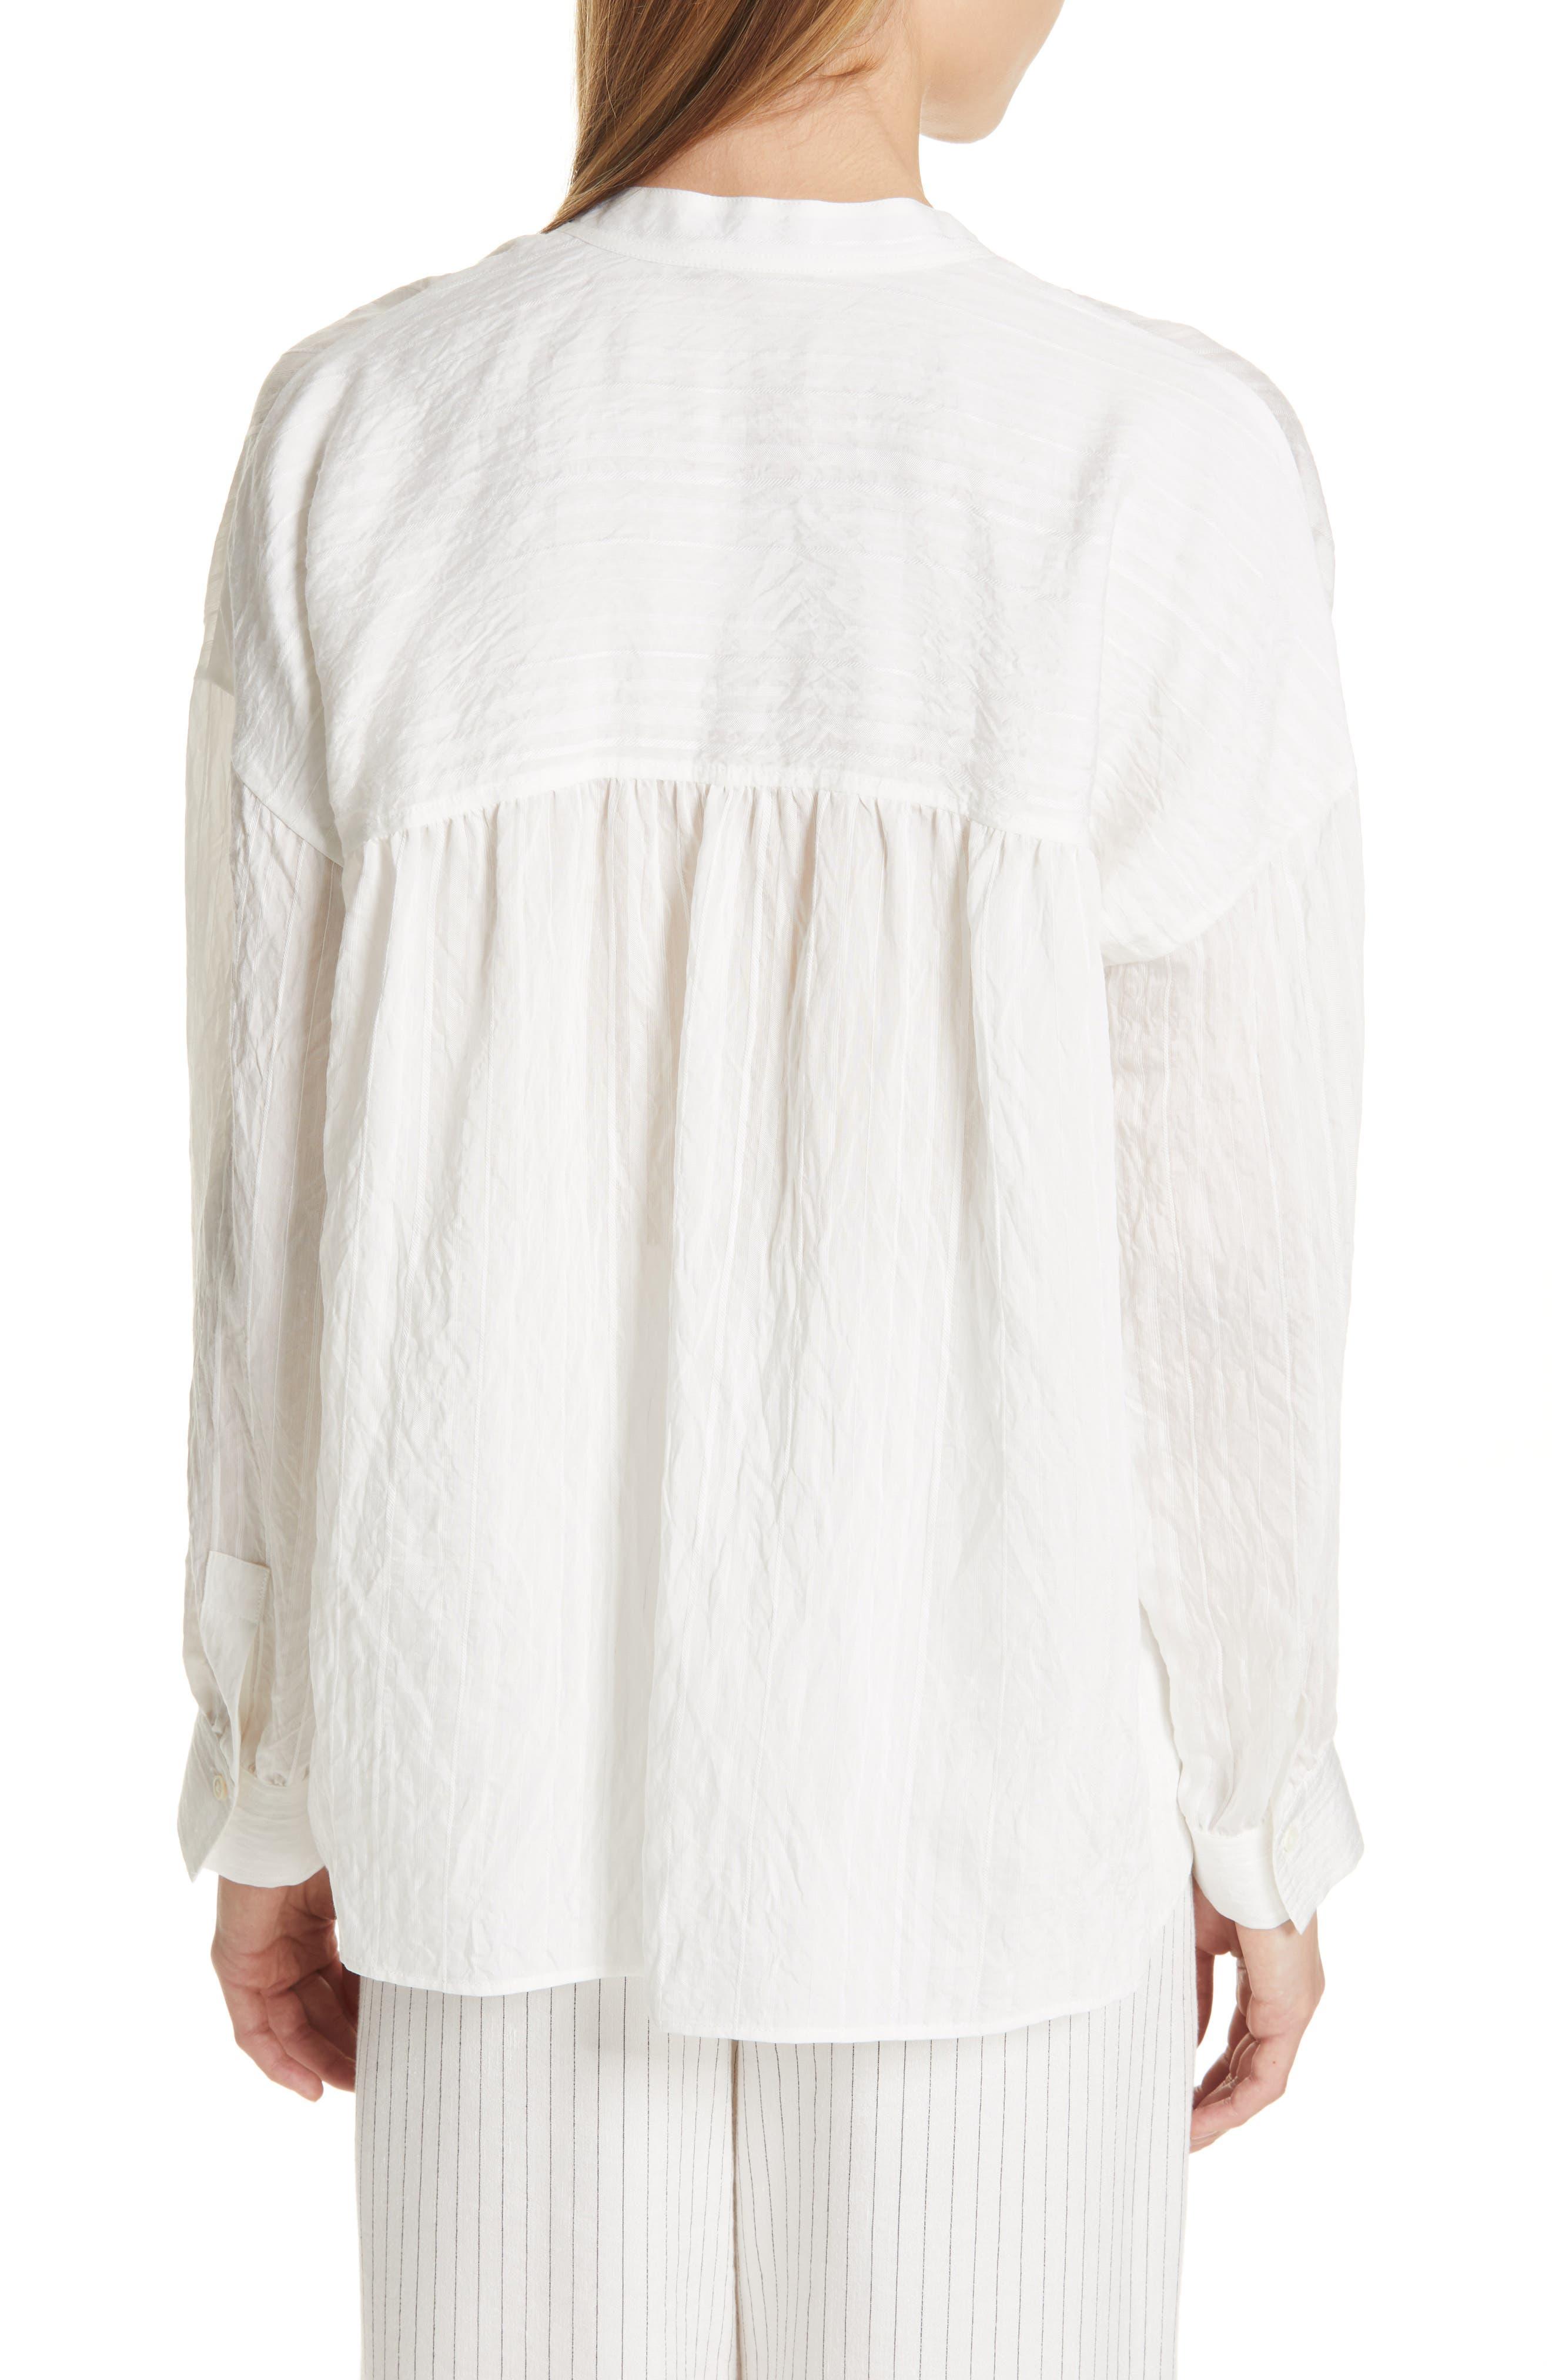 VINCE, Stripe Drop Sleeve Shirt, Alternate thumbnail 2, color, OPTIC WHITE